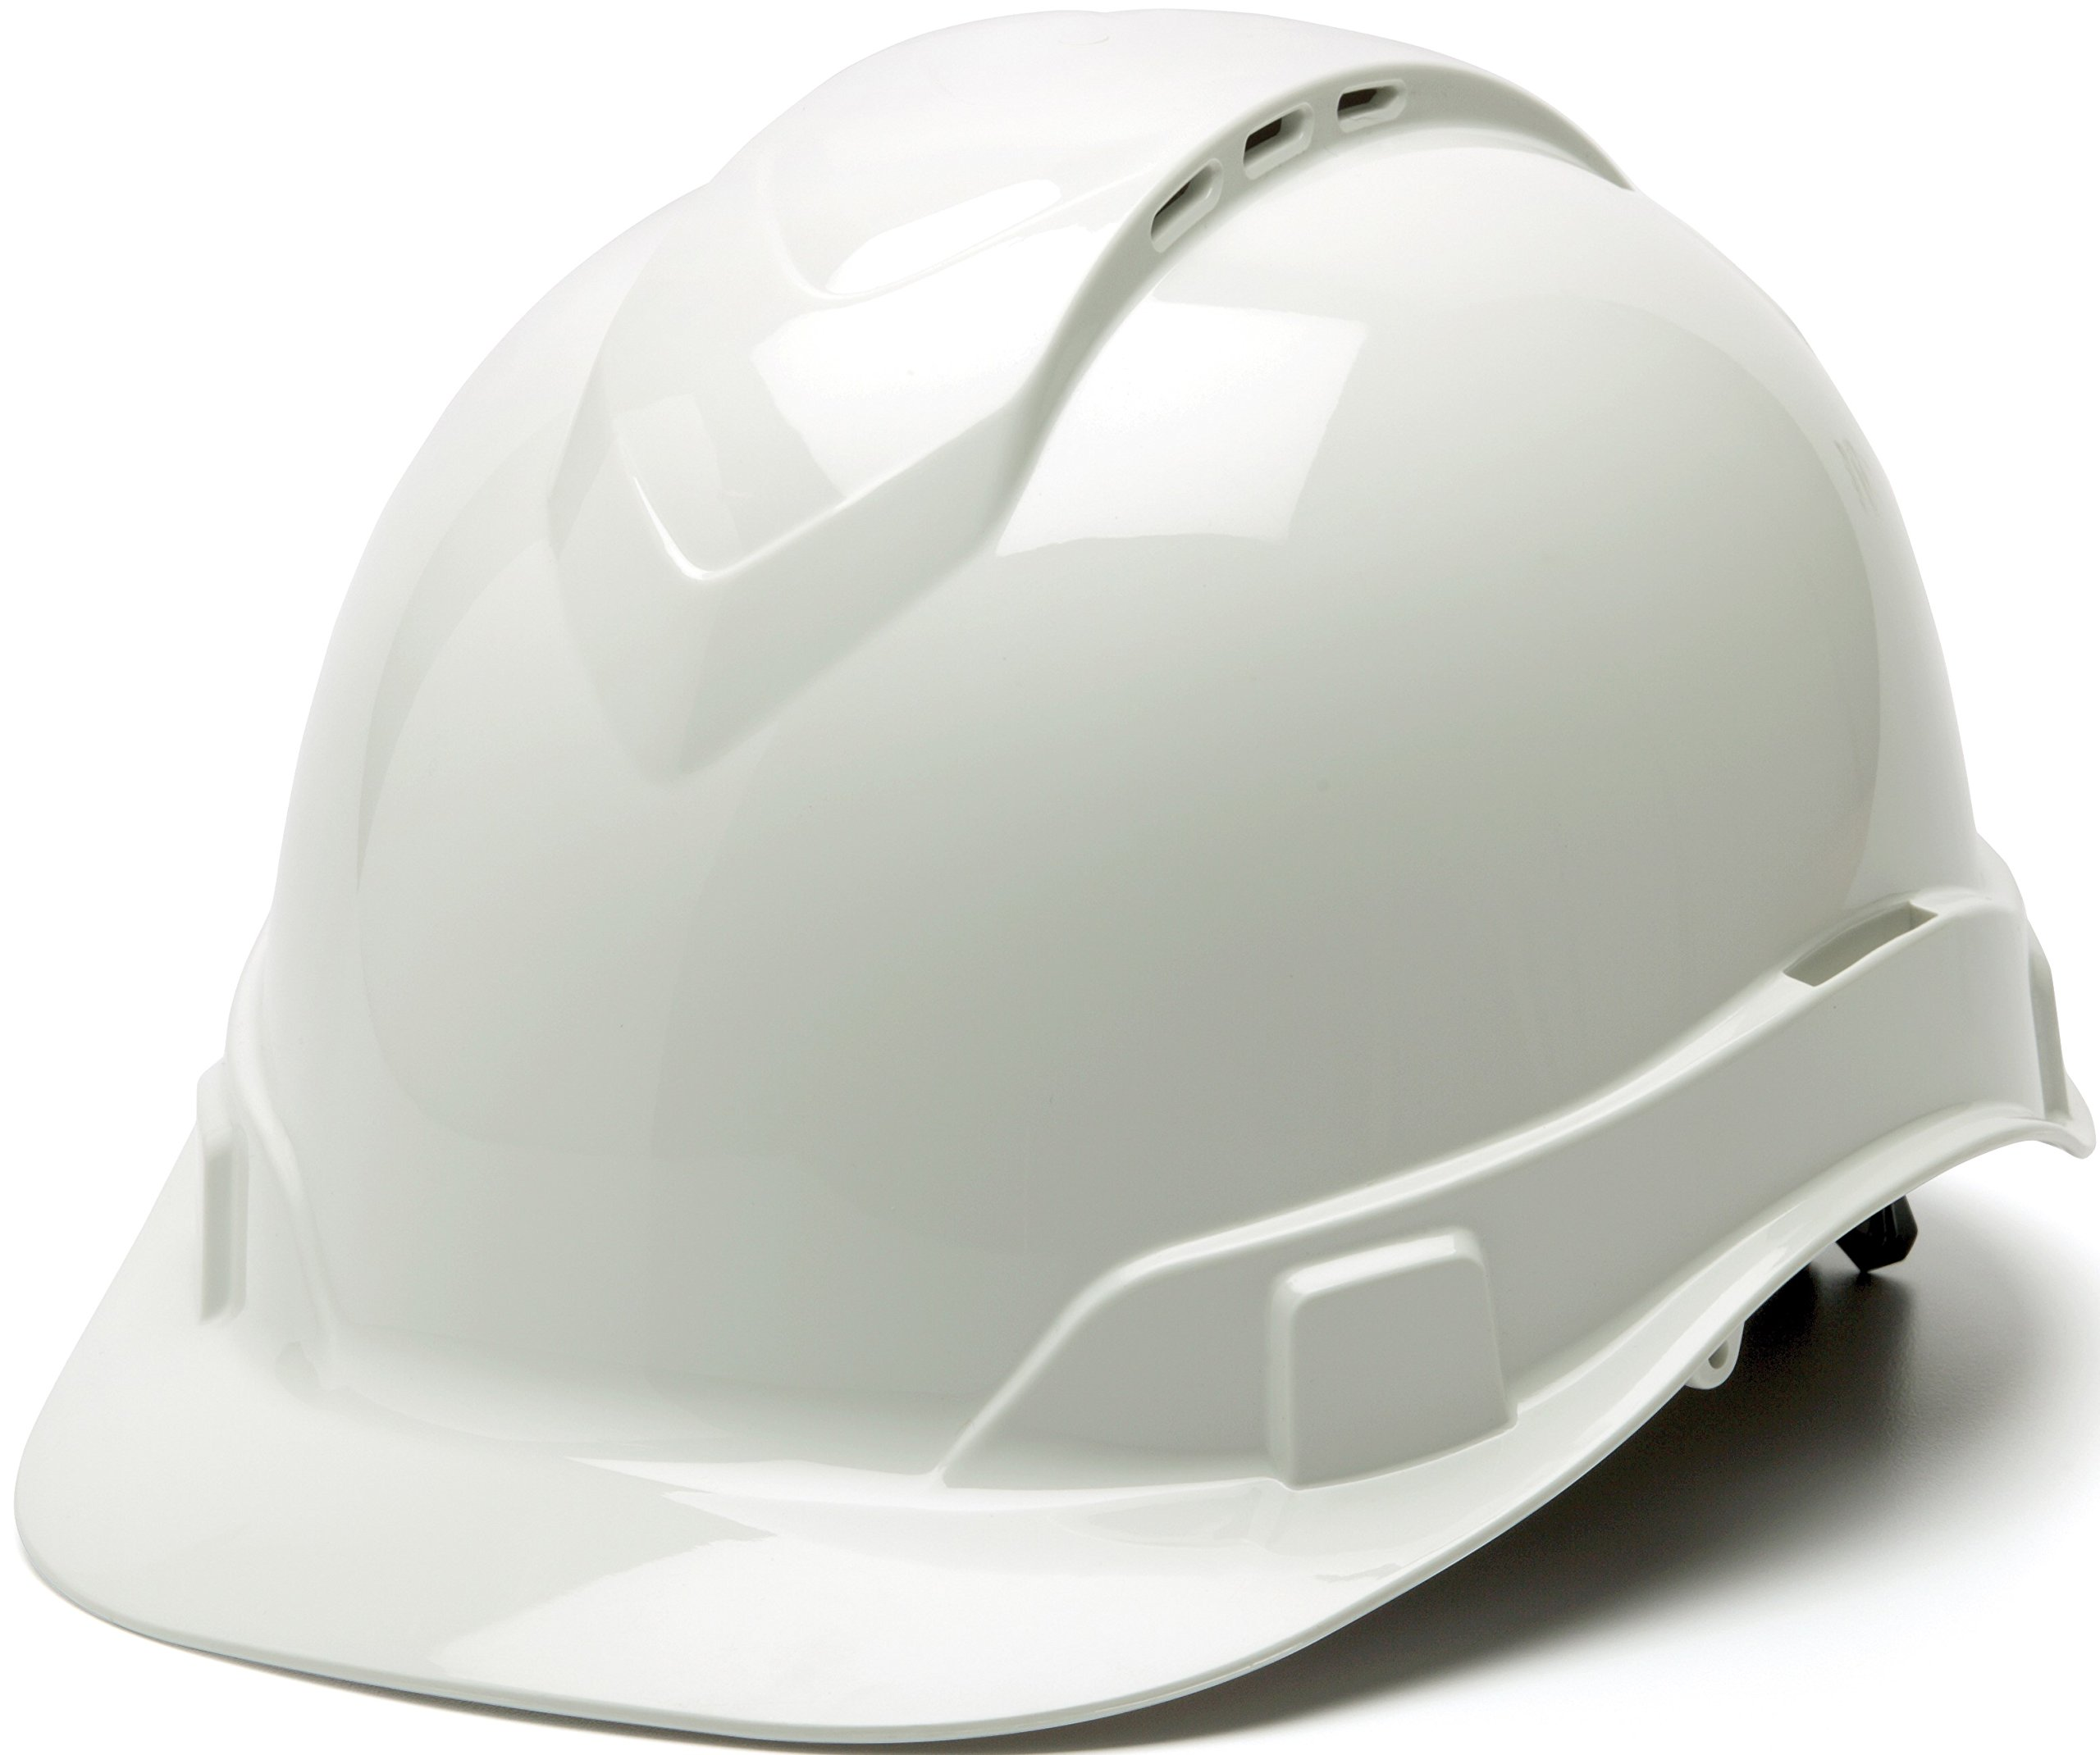 Pyramex Ridgeline Cap Style Hard Hat, Vented, 4-Point Ratchet Suspension, White by Pyramex Safety